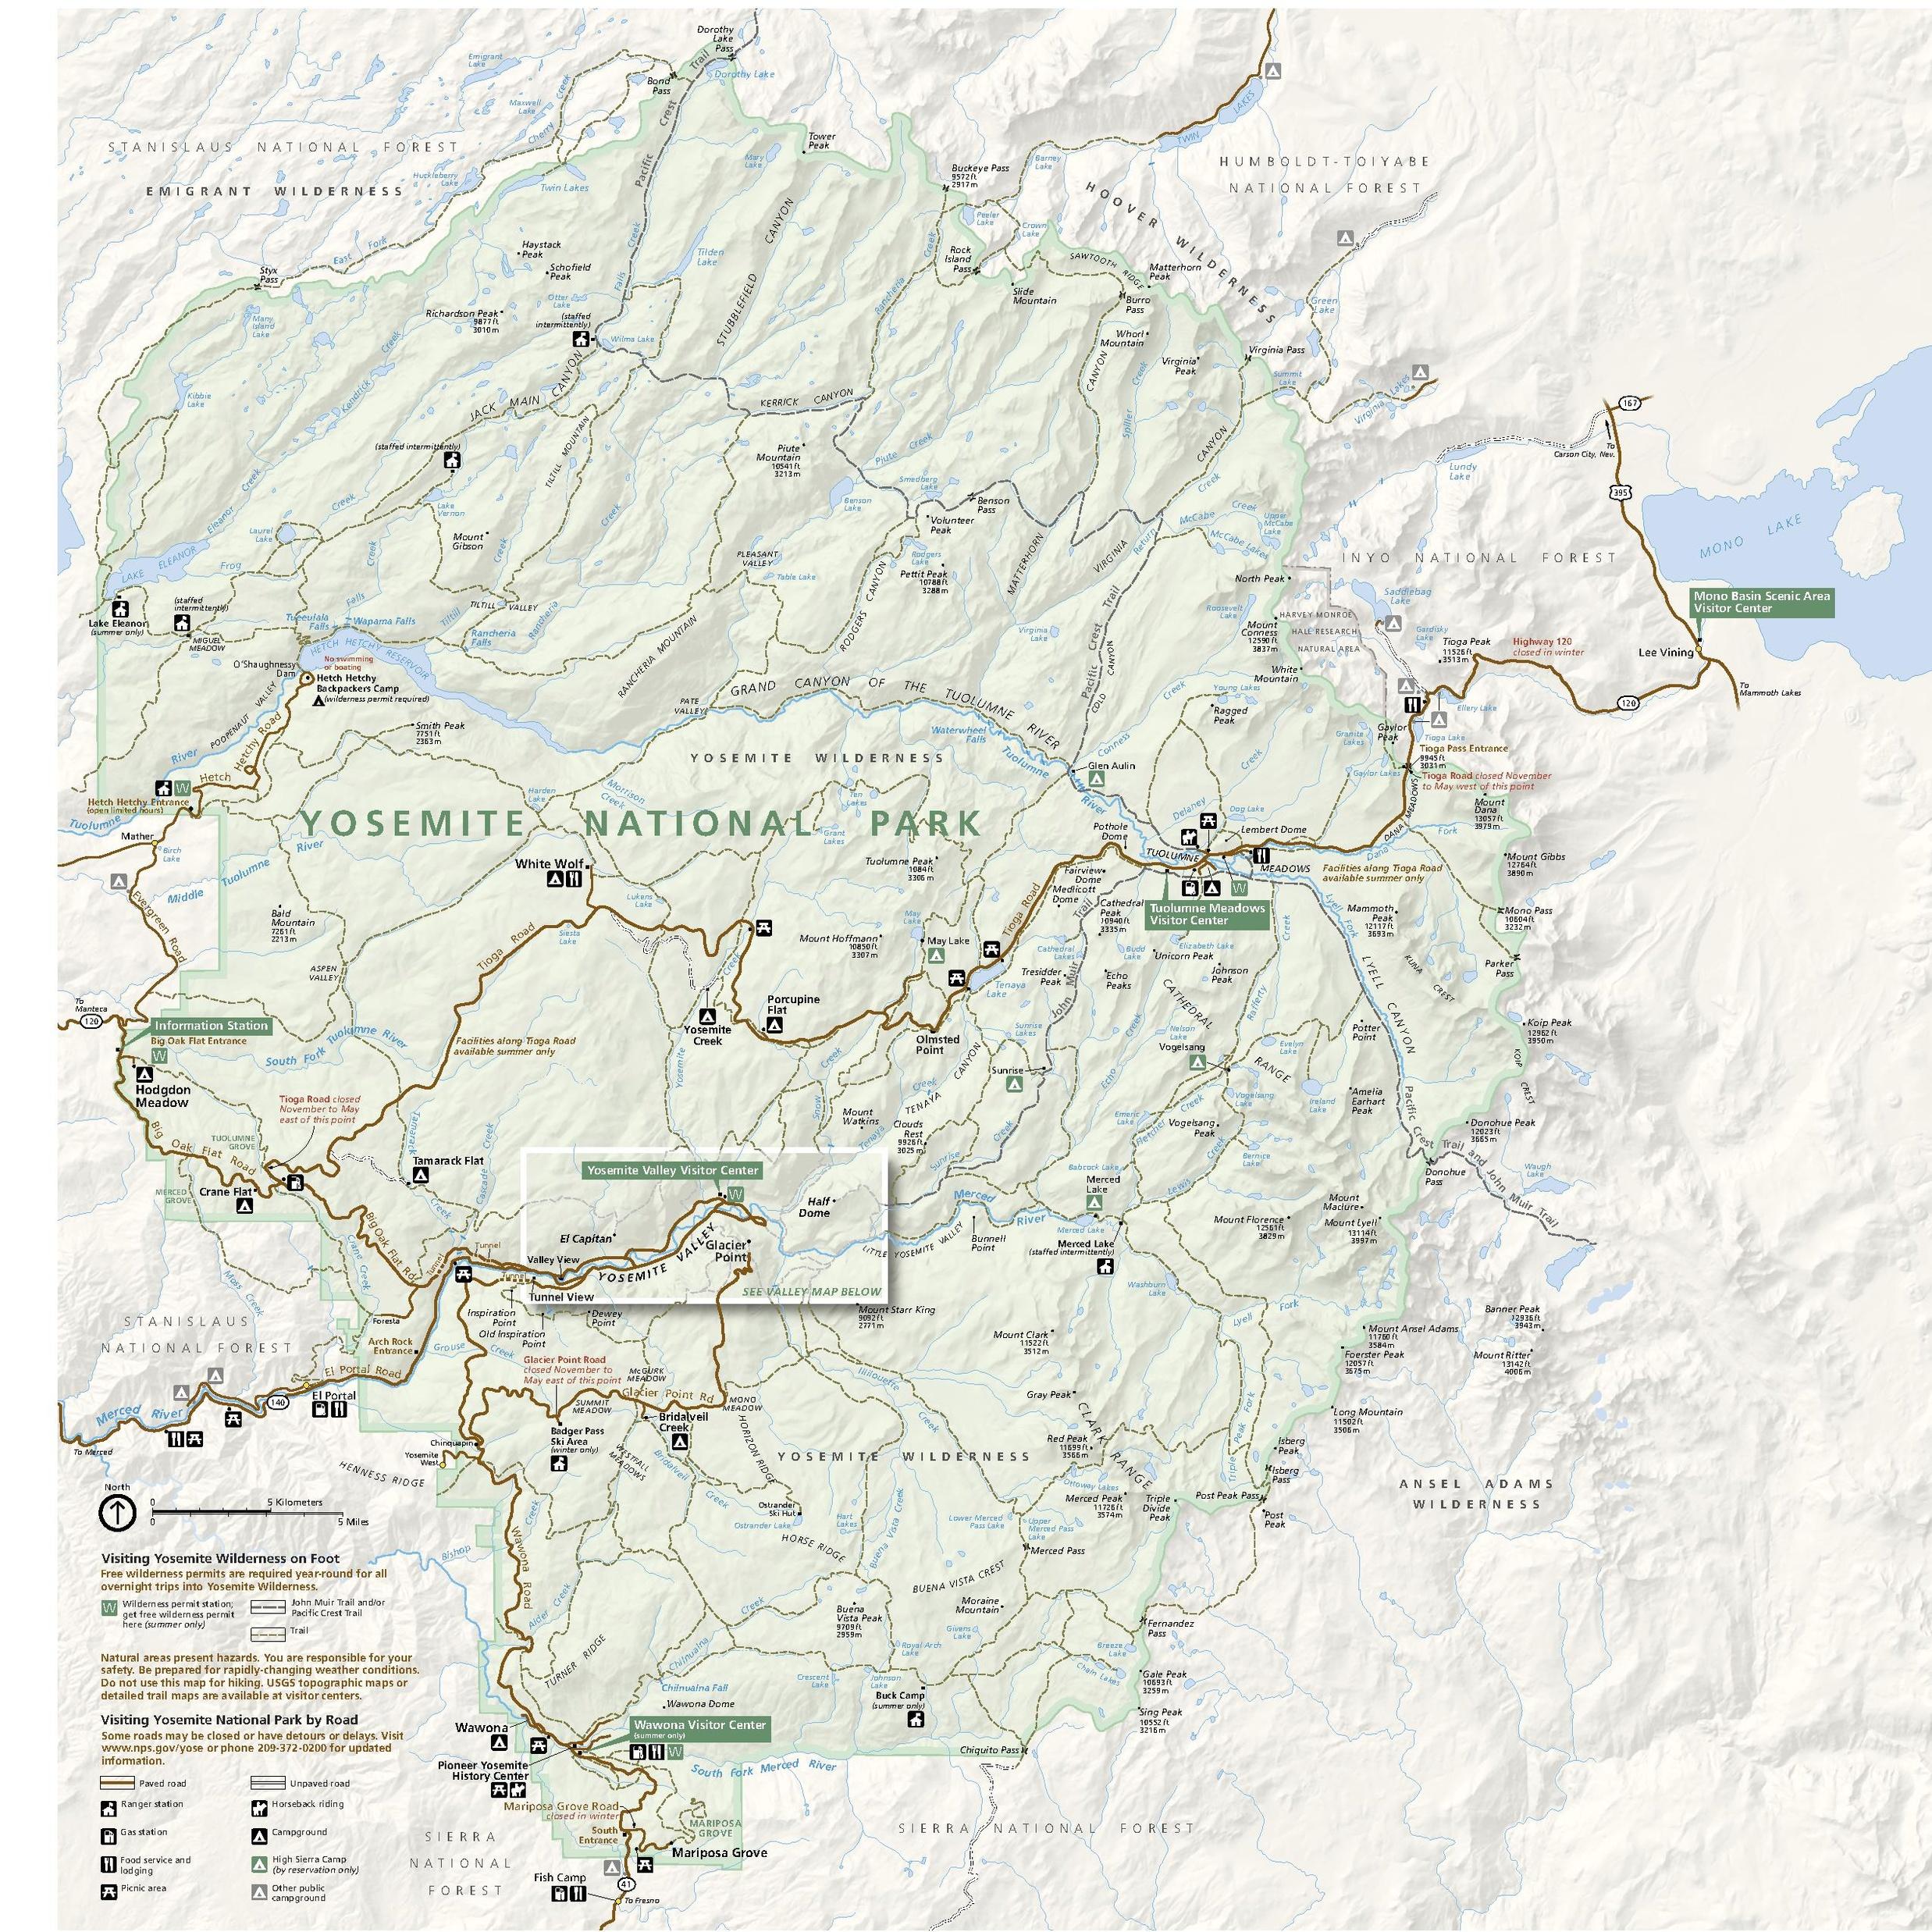 File:NPS yosemite-map.pdf - Wikimedia Commons on glacier np map pdf, west point map pdf, great smoky mountain map pdf, arches national park map pdf, california map pdf, princeton map pdf, columbia map pdf, glacier national park map pdf, inyo national forest map pdf, crater lake map pdf, ontario map pdf, sonoma map pdf, vancouver map pdf, yellowstone map pdf, sacramento map pdf, el cajon map pdf, west los angeles map pdf, lake arrowhead map pdf, atlanta map pdf, pacific crest trail map pdf,